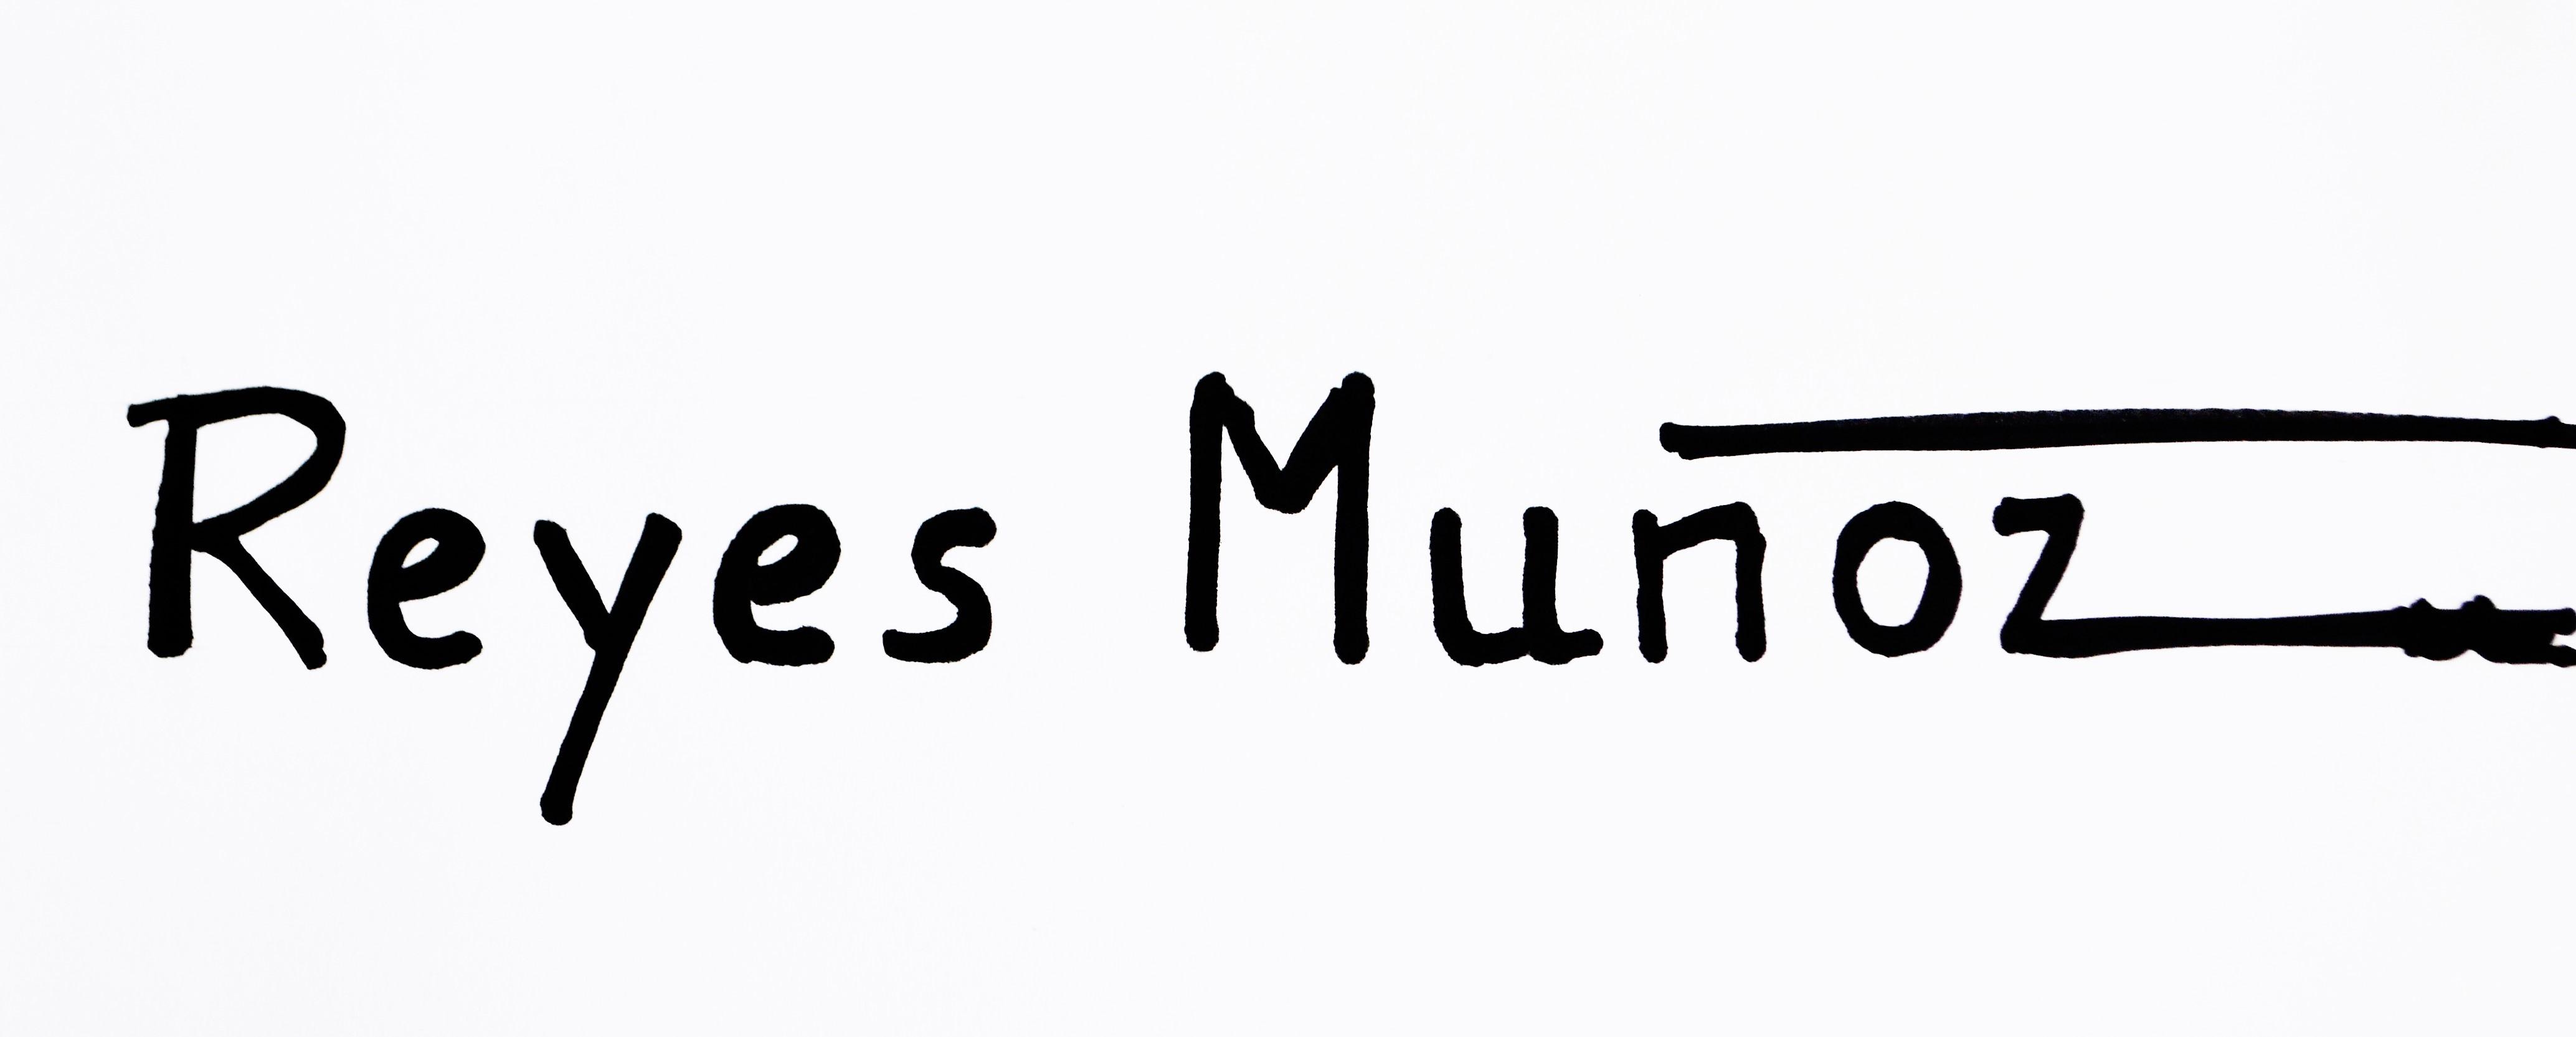 REYES MUÑOZ's Signature